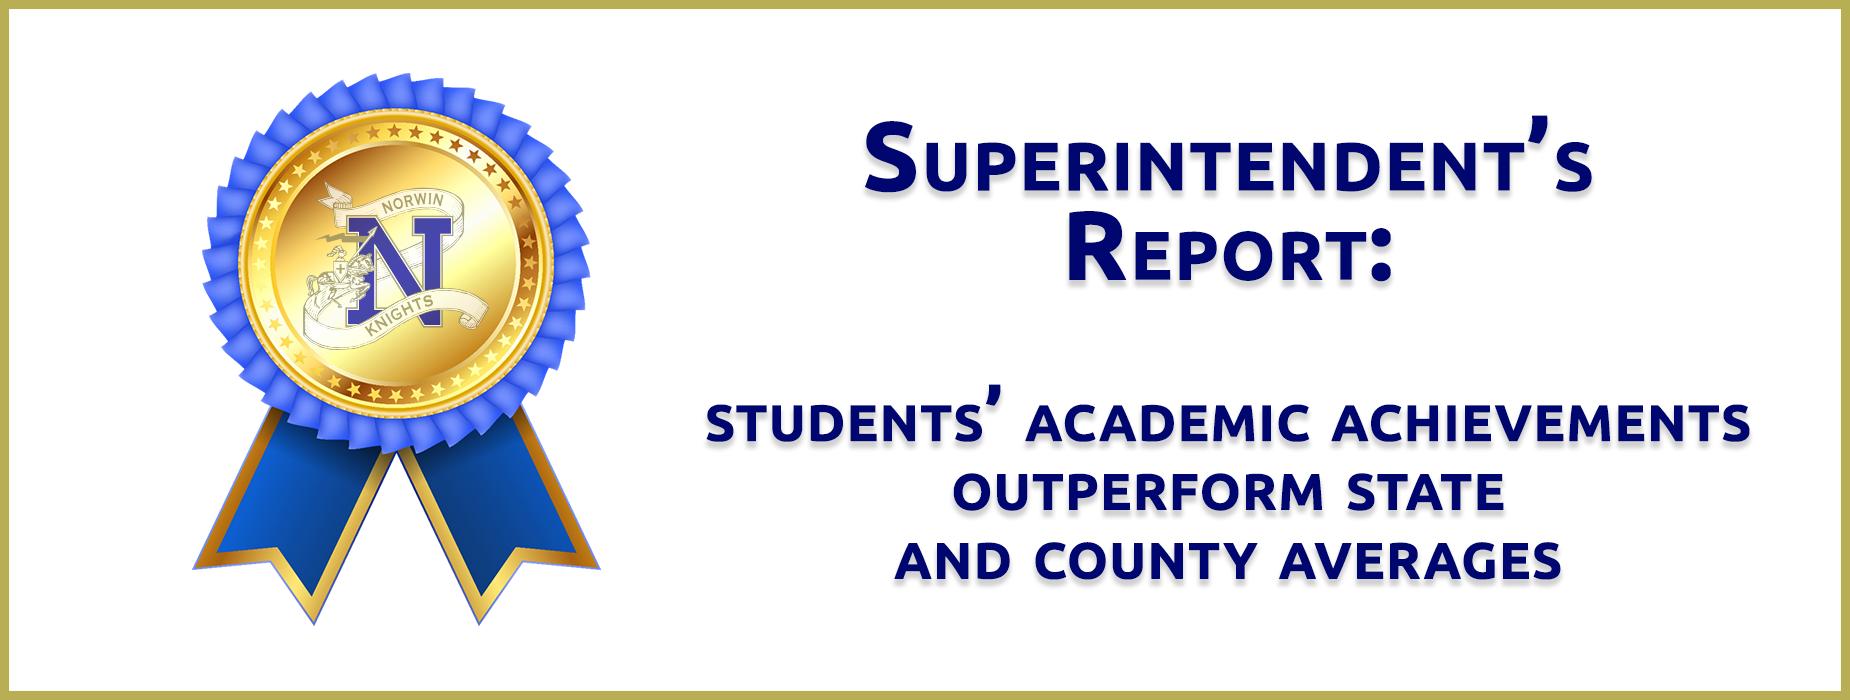 Superintendents' Report